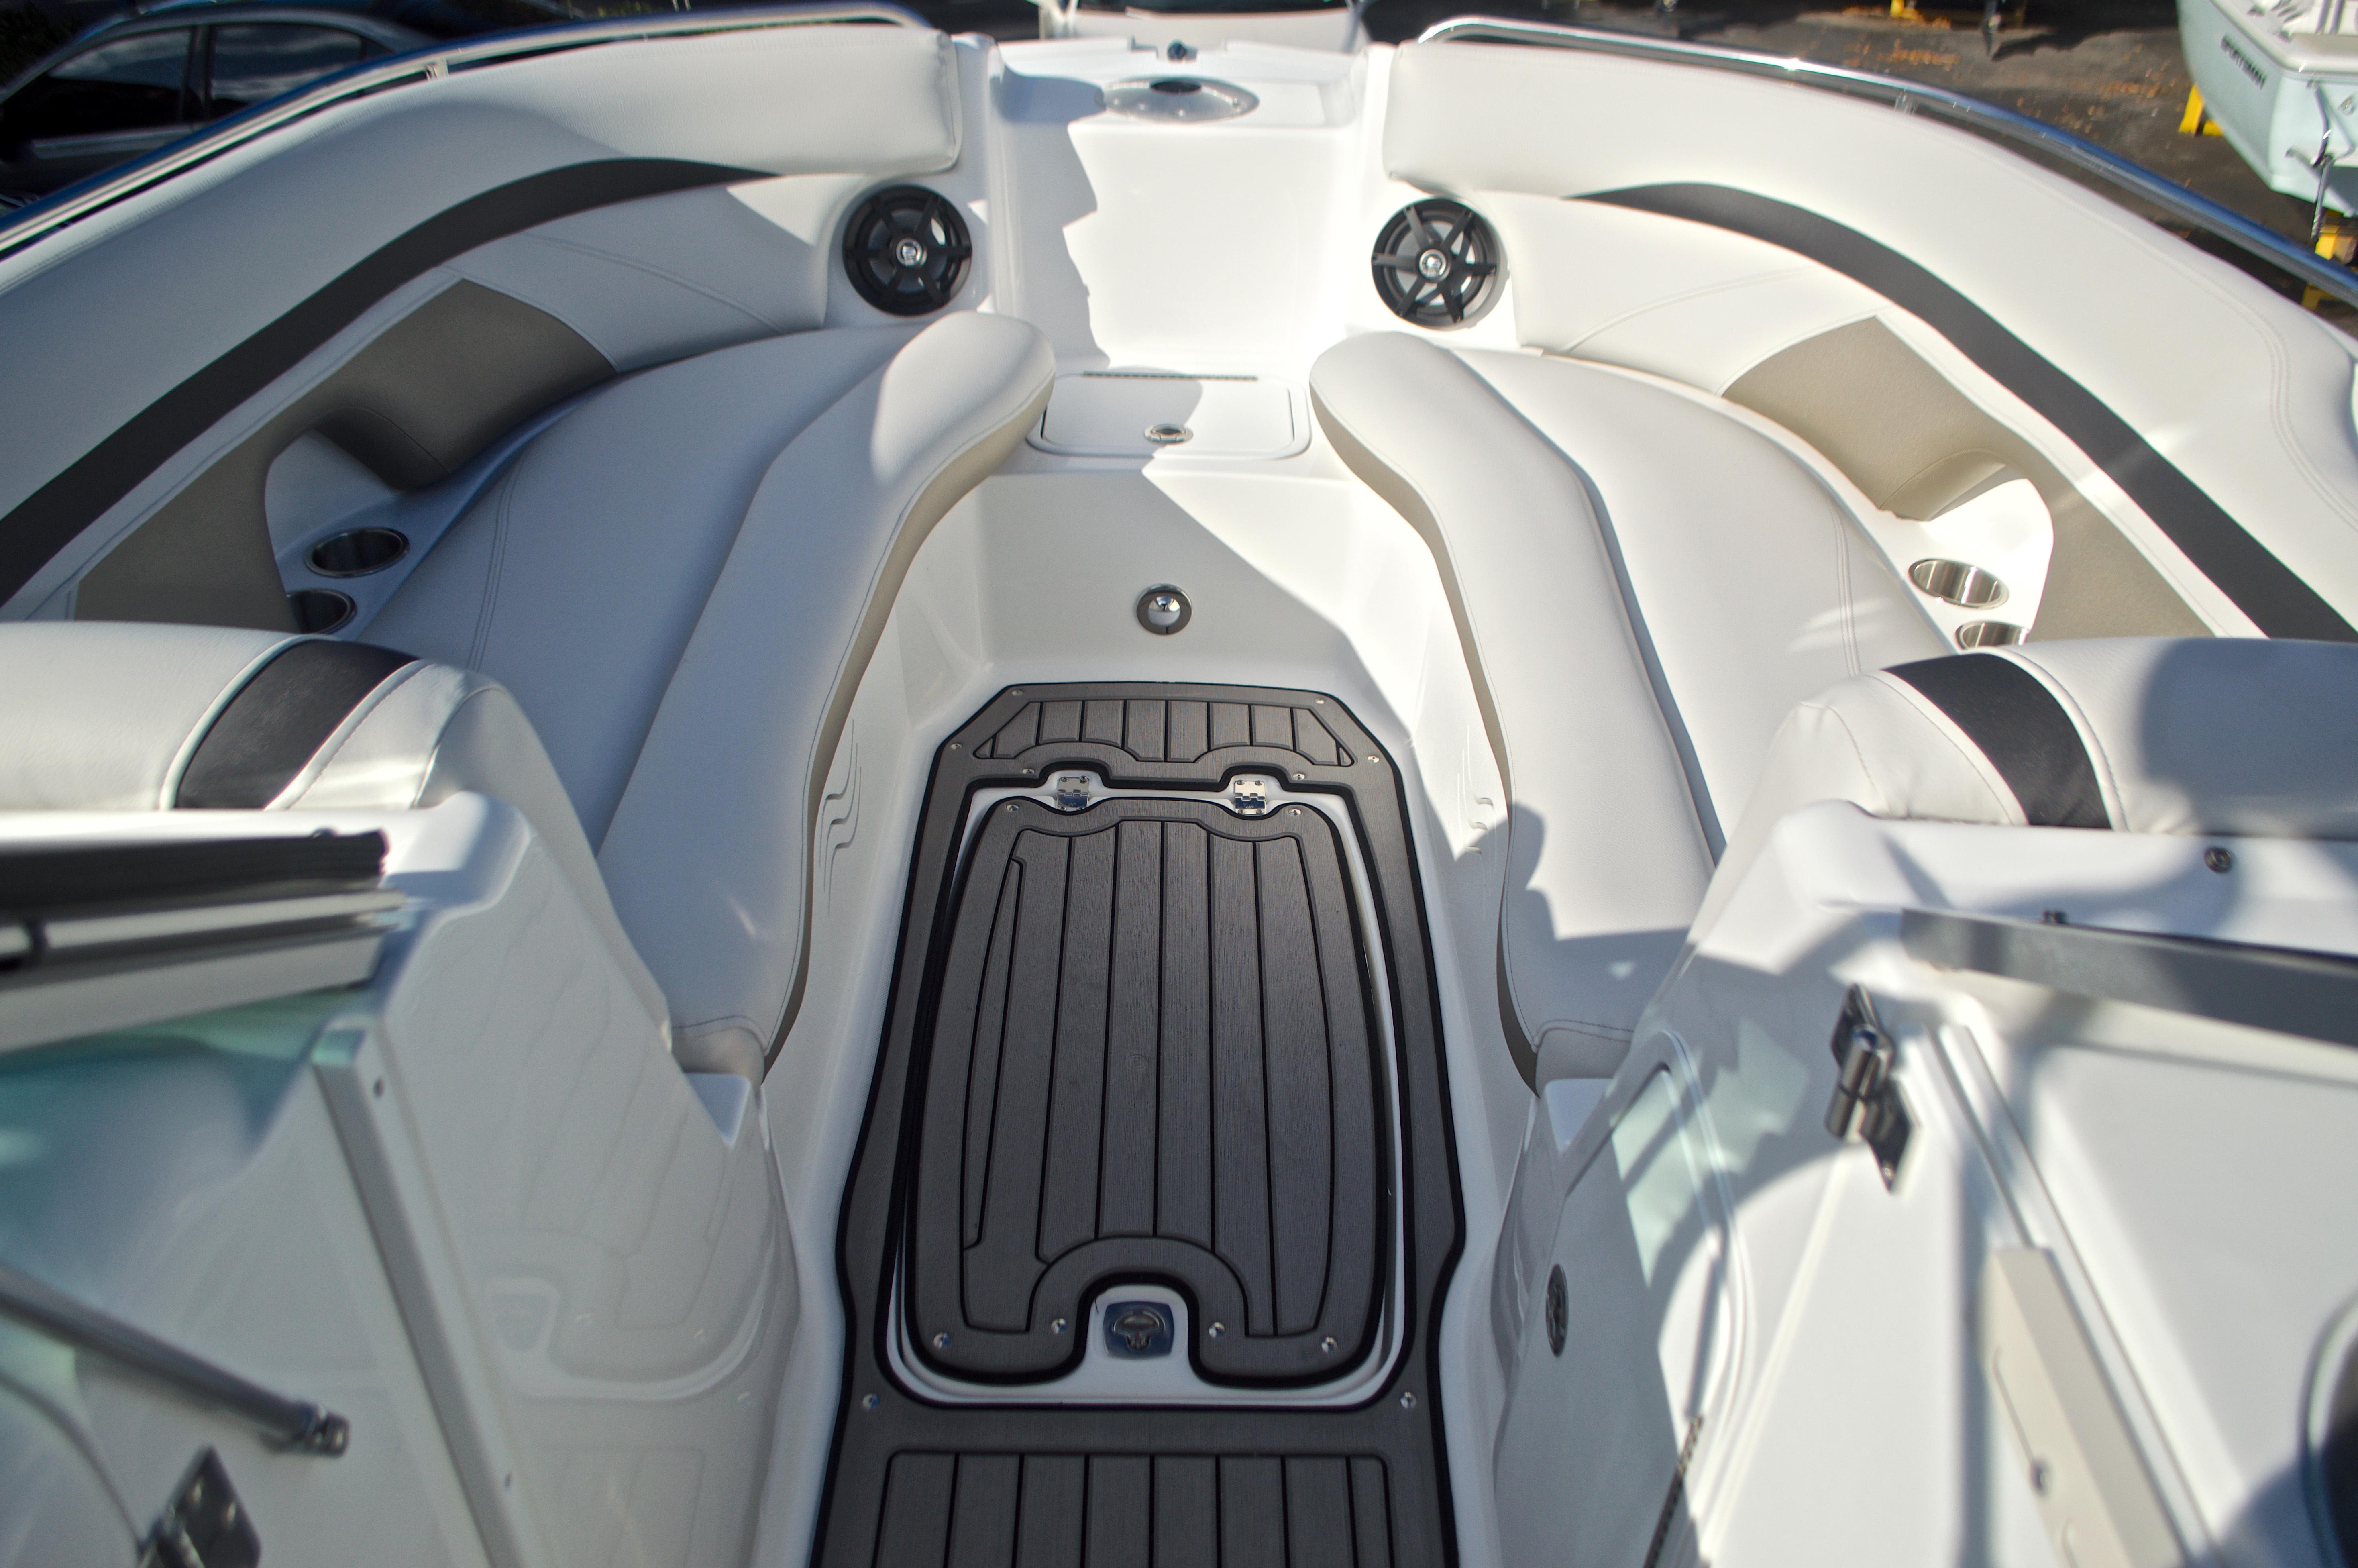 Thumbnail 56 for New 2017 Hurricane SunDeck SD 2400 OB boat for sale in Miami, FL